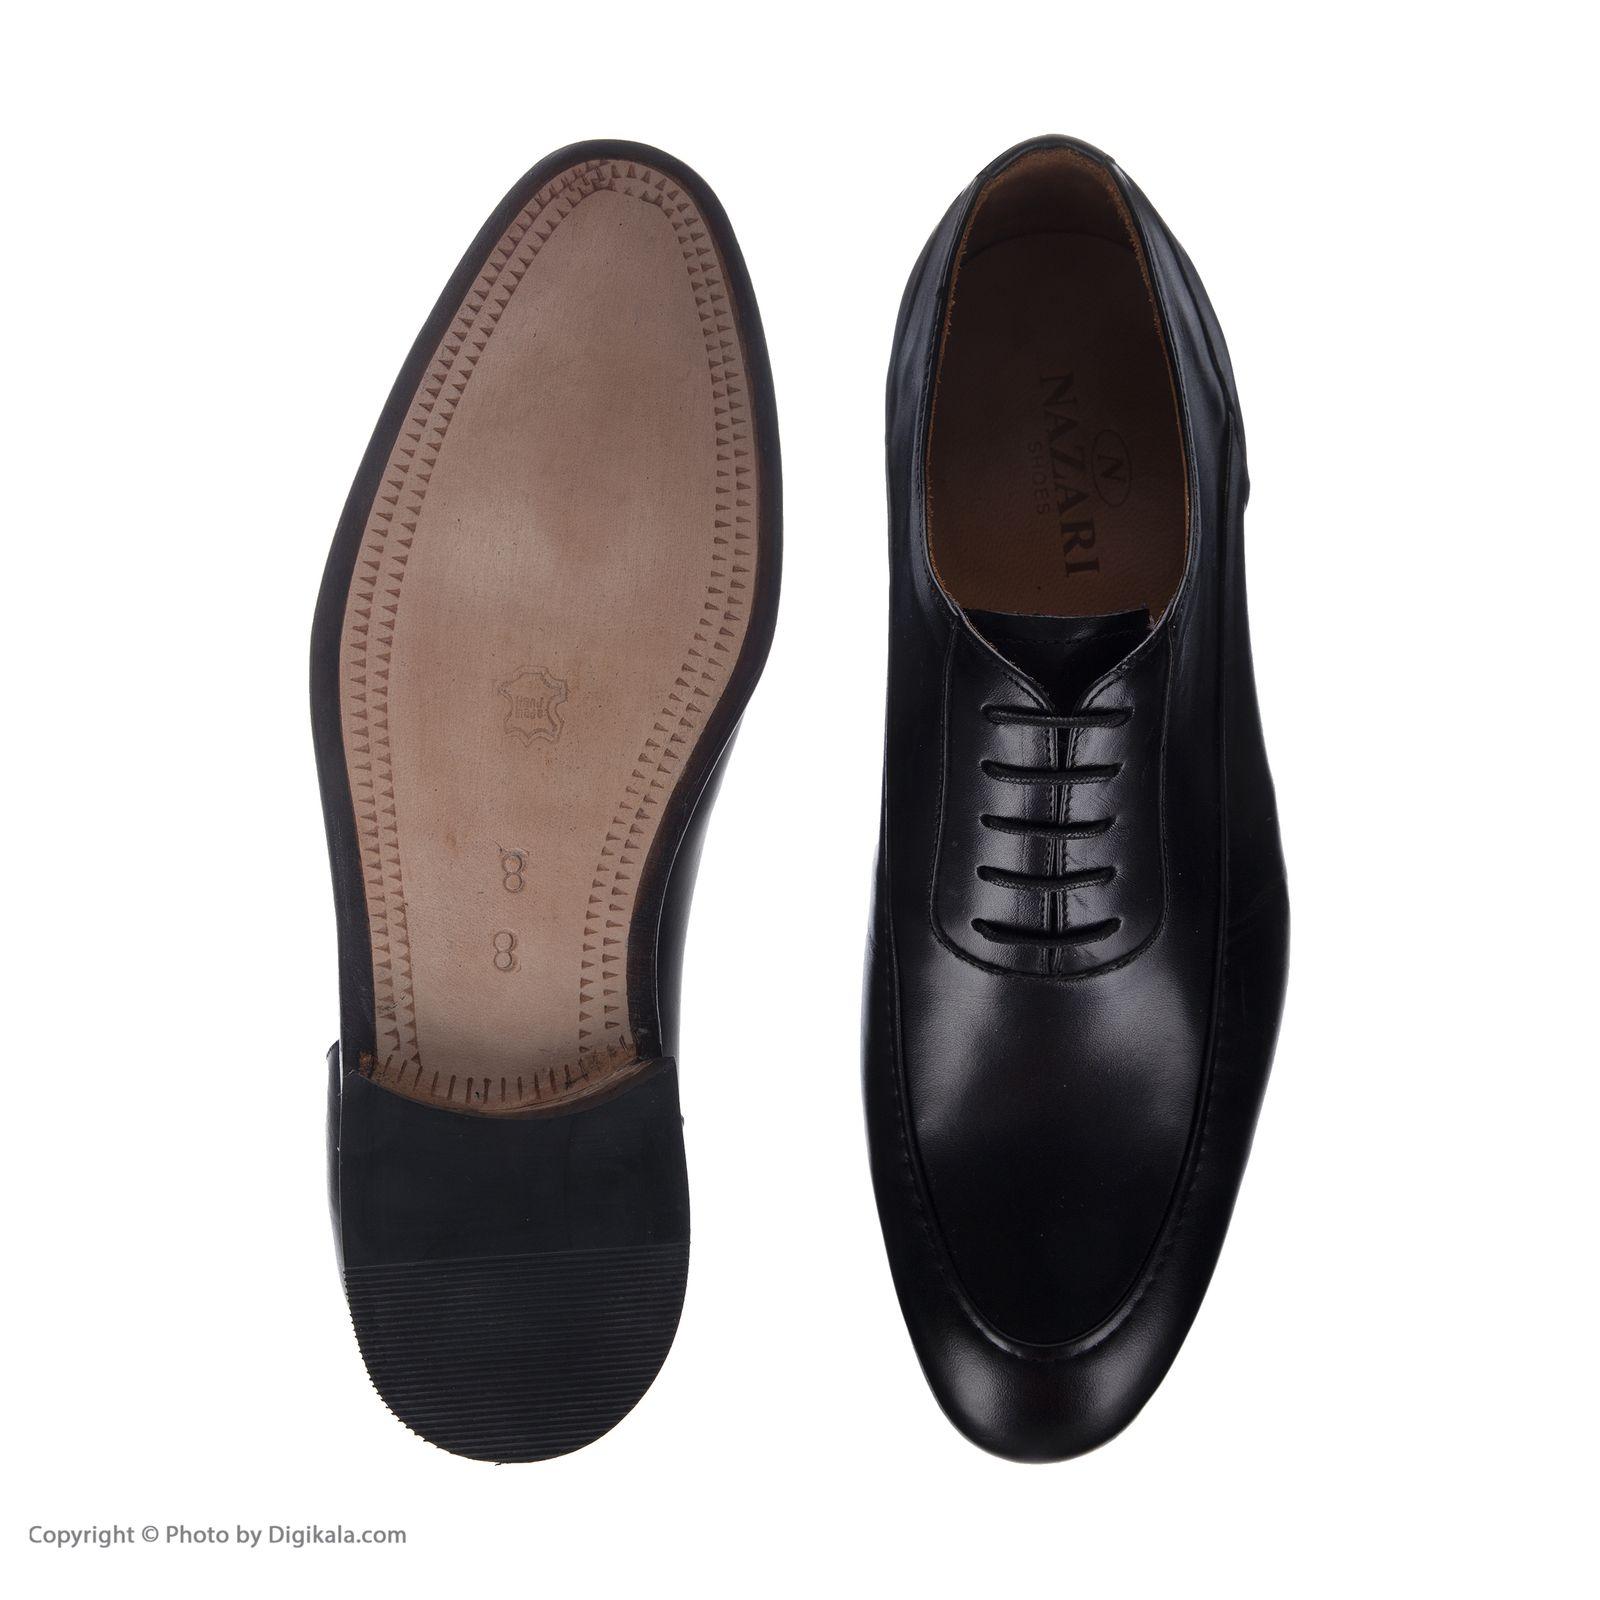 کفش مردانه نظری کد 425 -  - 5